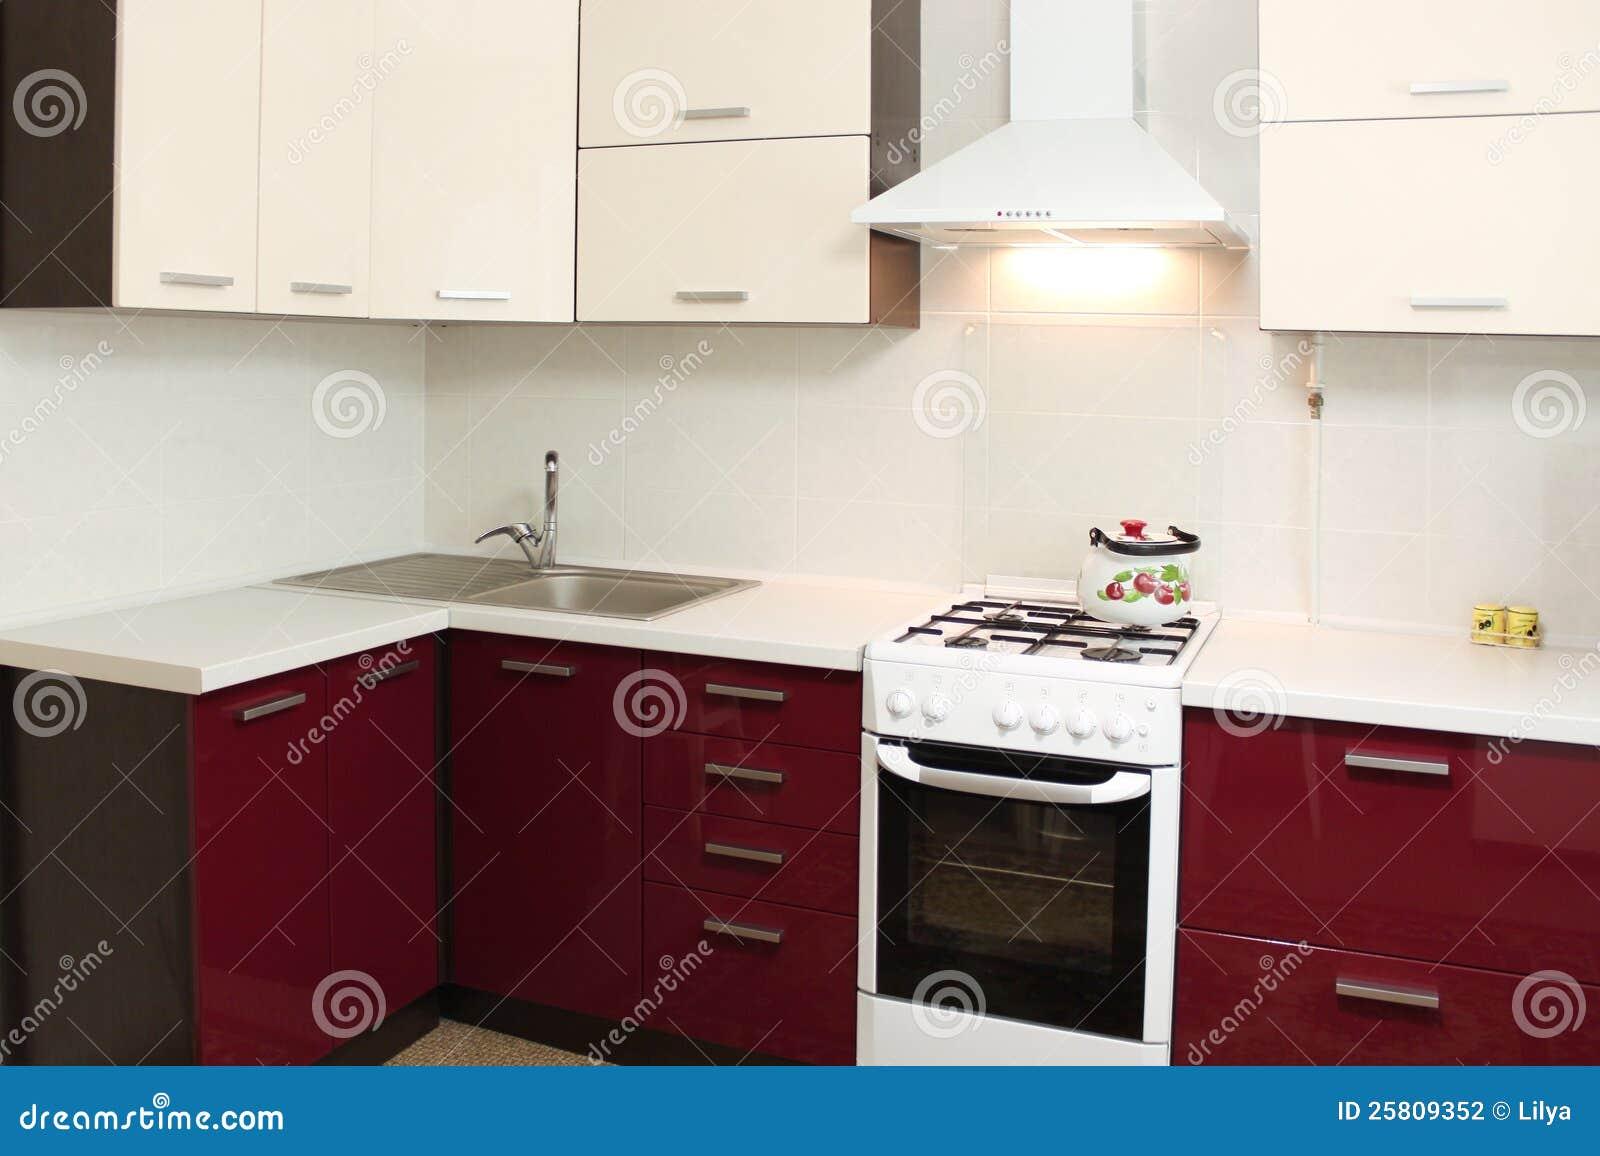 Dise o interior de la cocina dom stica foto de archivo for Diseno interior cocina